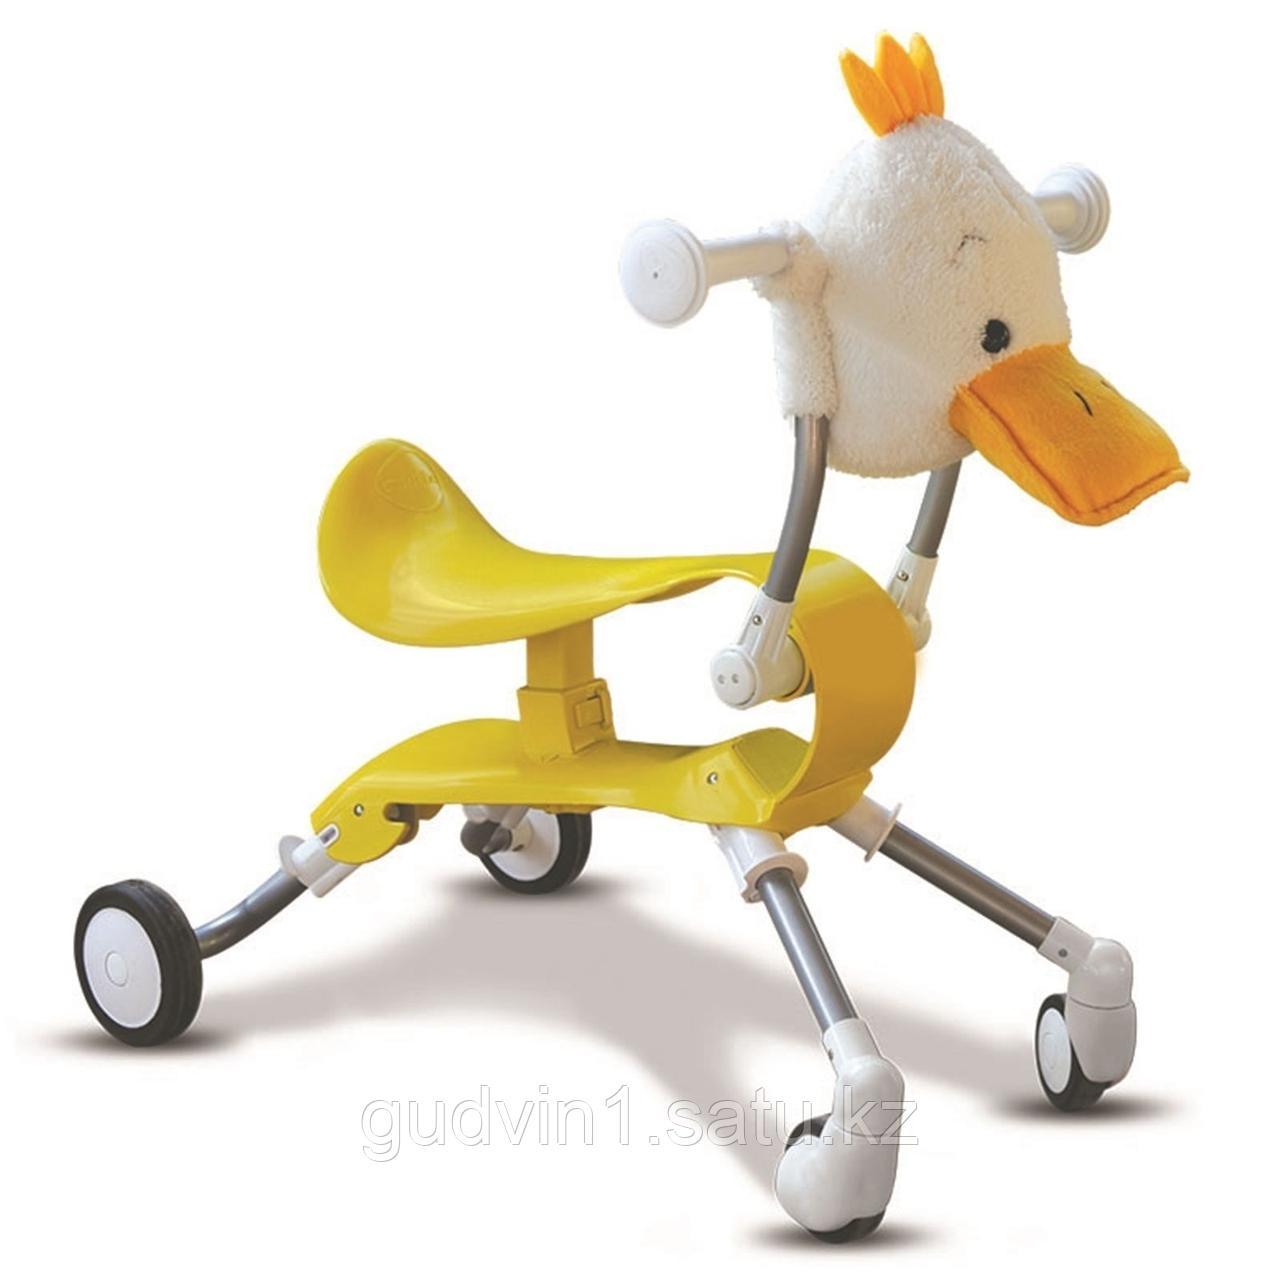 Каталка-прыгунки SmartTrike Springo Farm Collection Duck